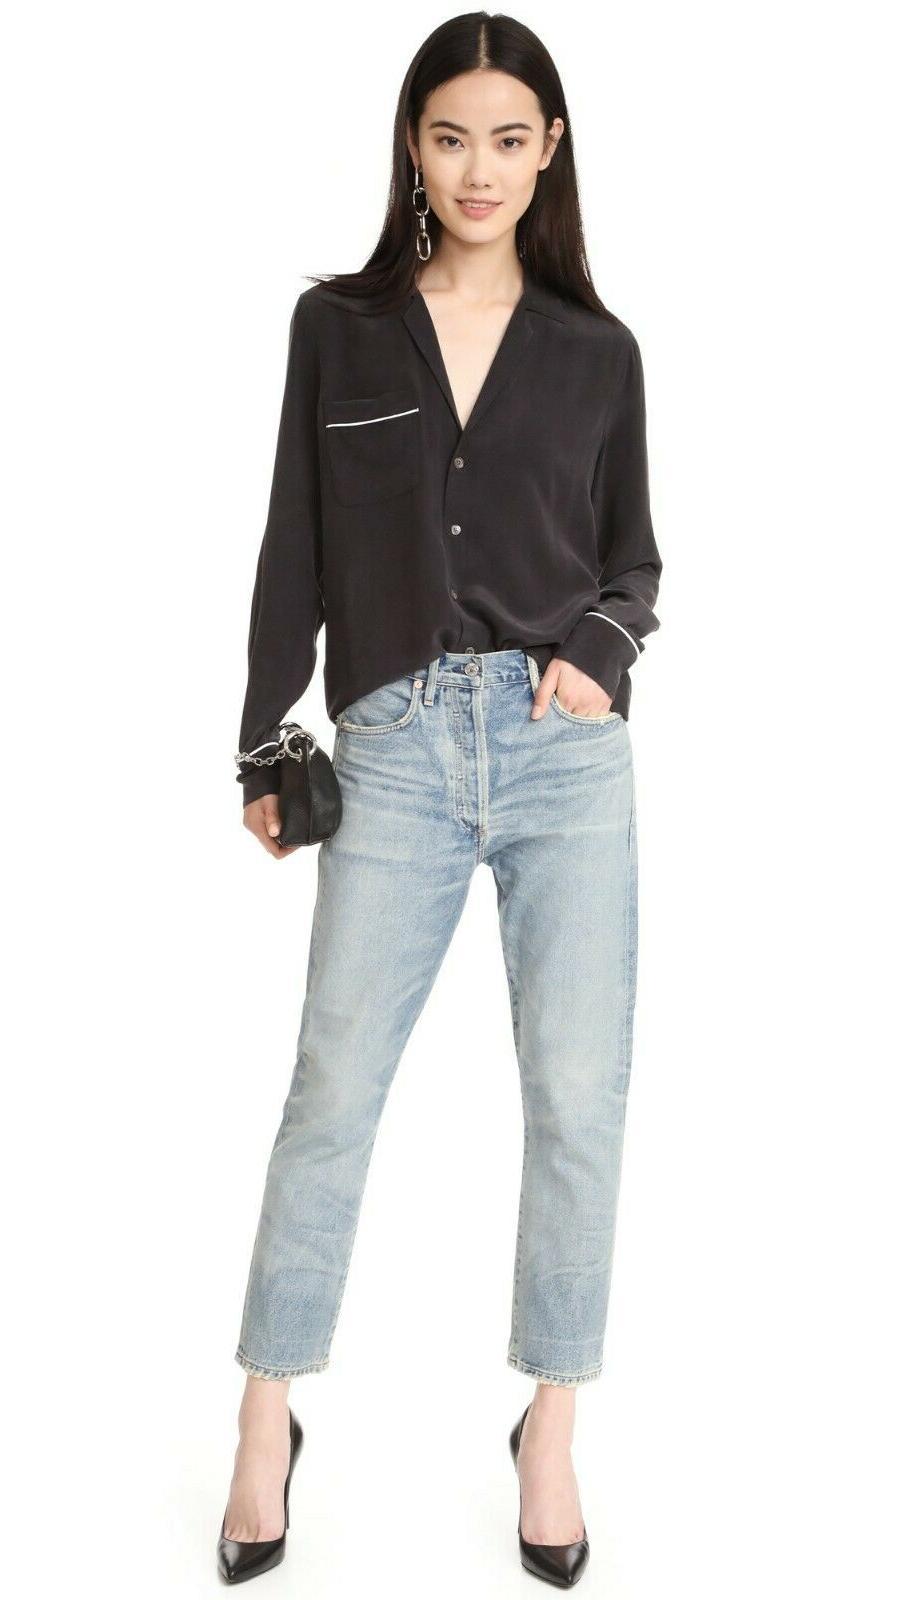 NWT Keira Silk Shirt Blouse, True Black Size S $218